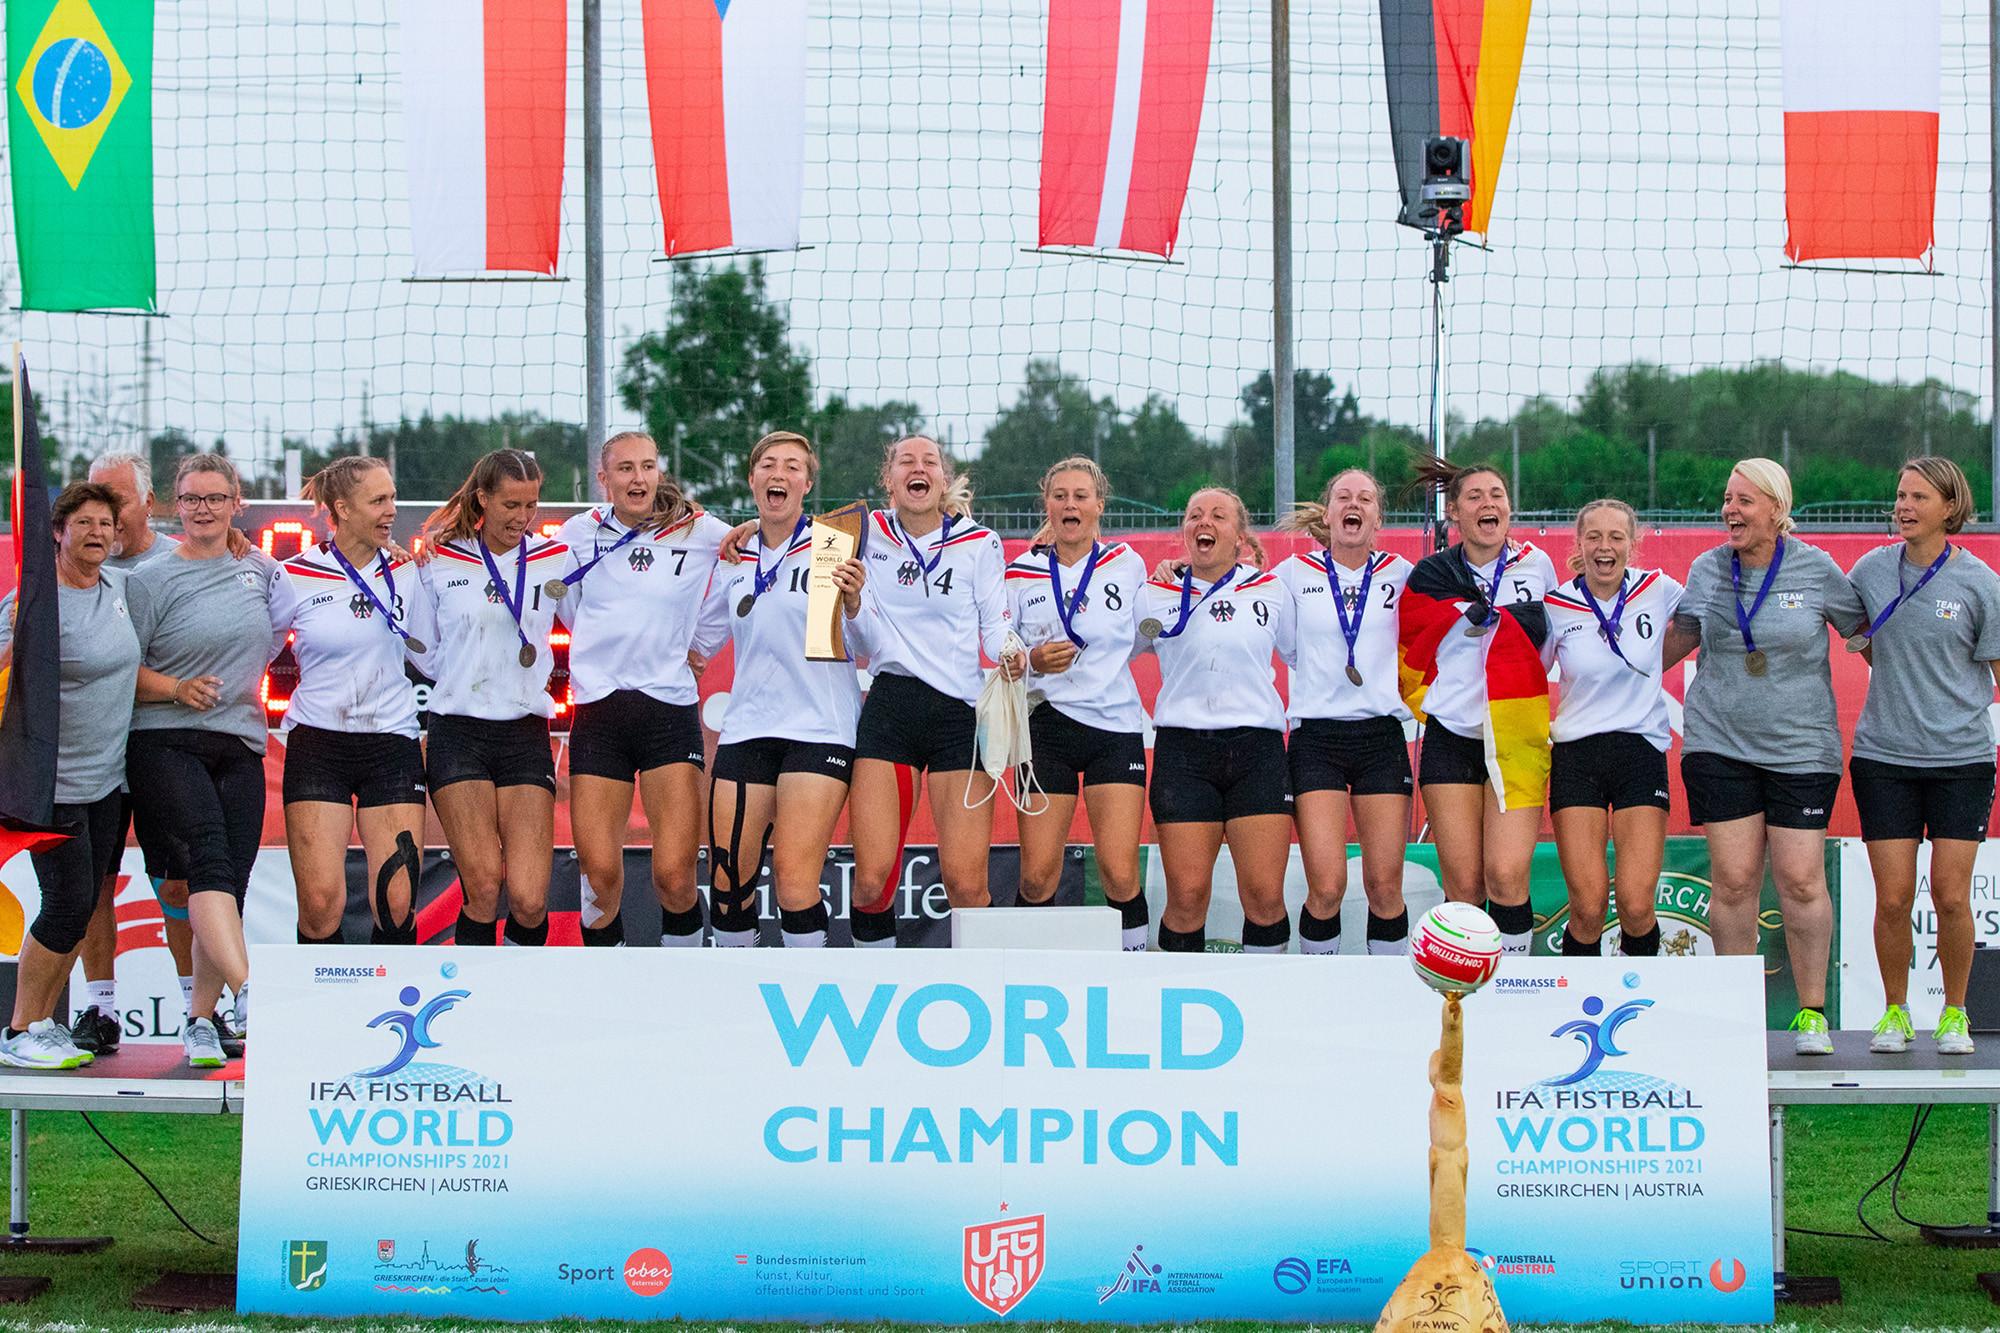 Germany win seventh Women's Fistball World Championship